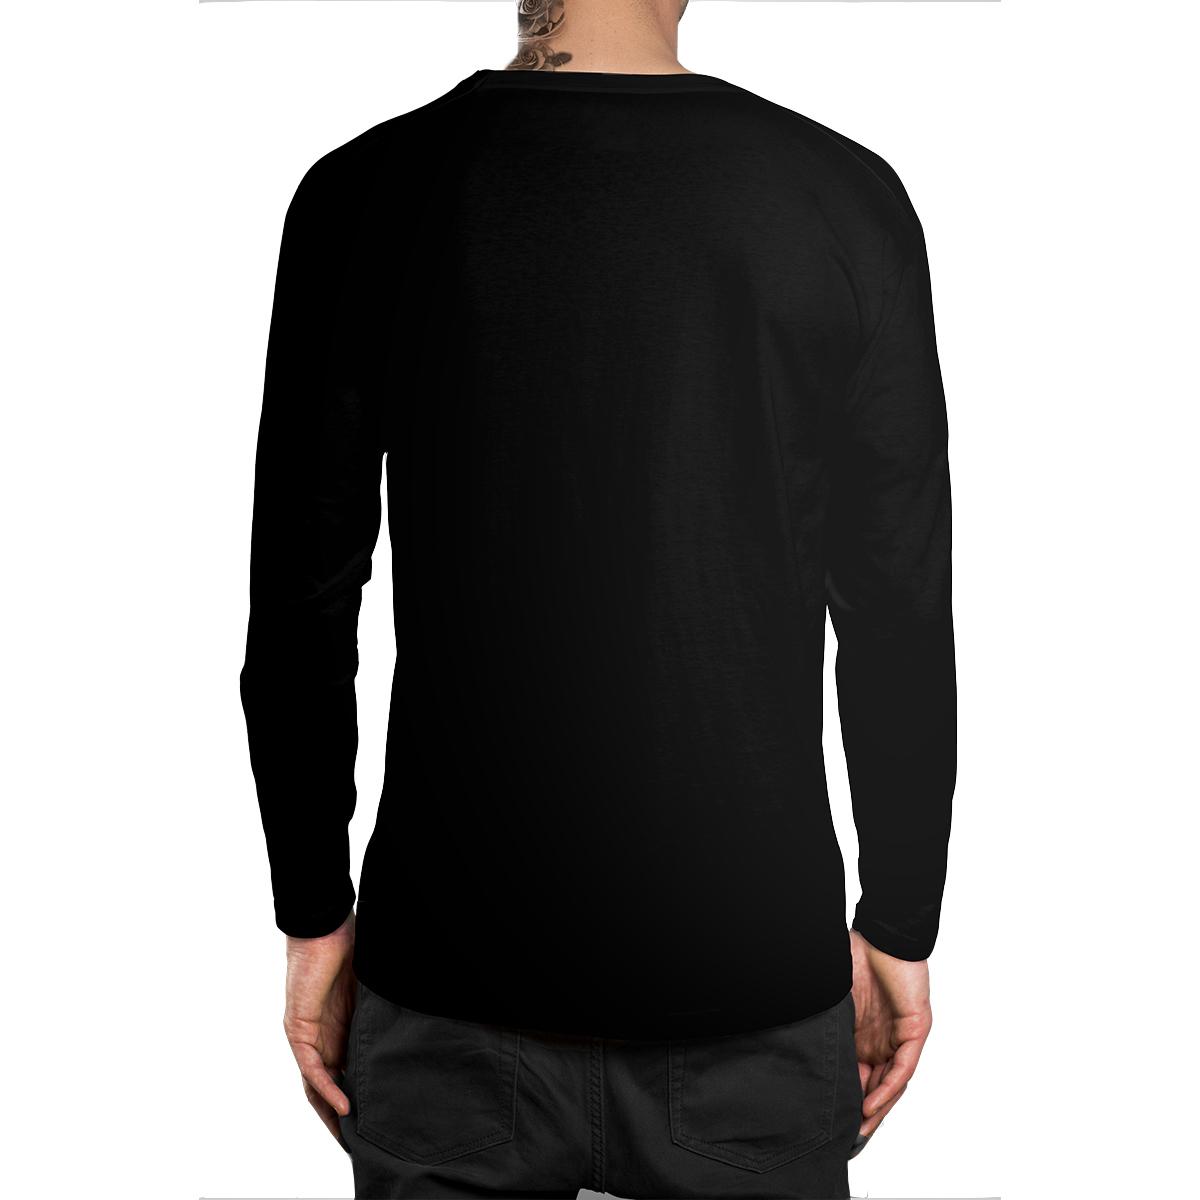 Stompy Camiseta Manga Longa Modelo 20